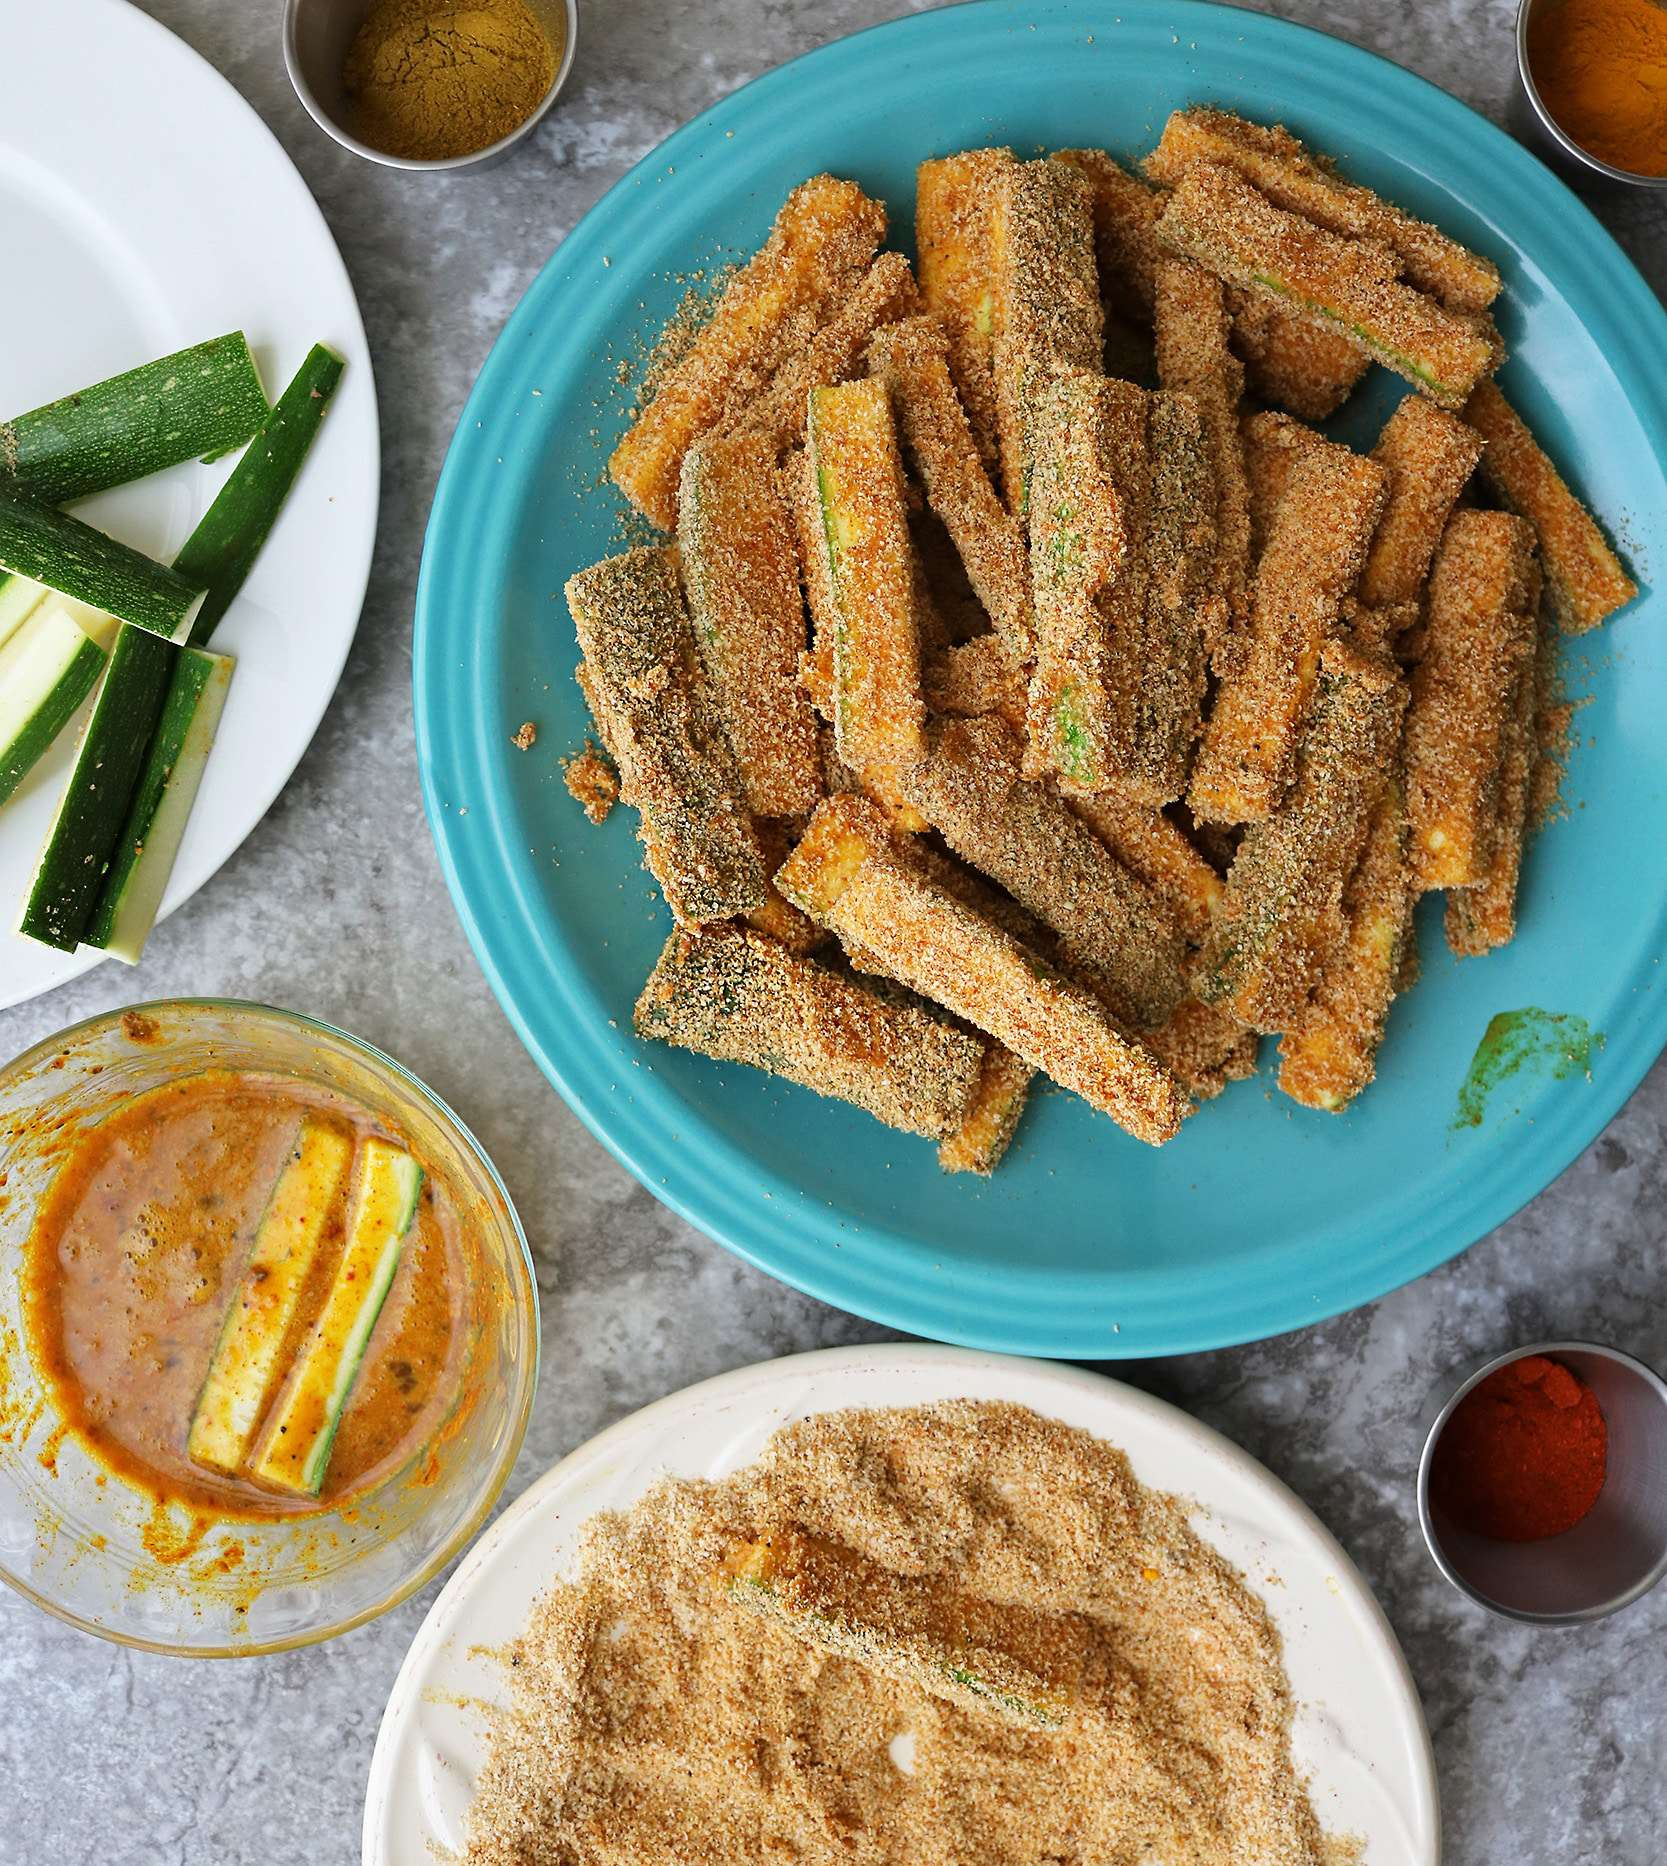 Making Air Fried Zucchini Fries Image